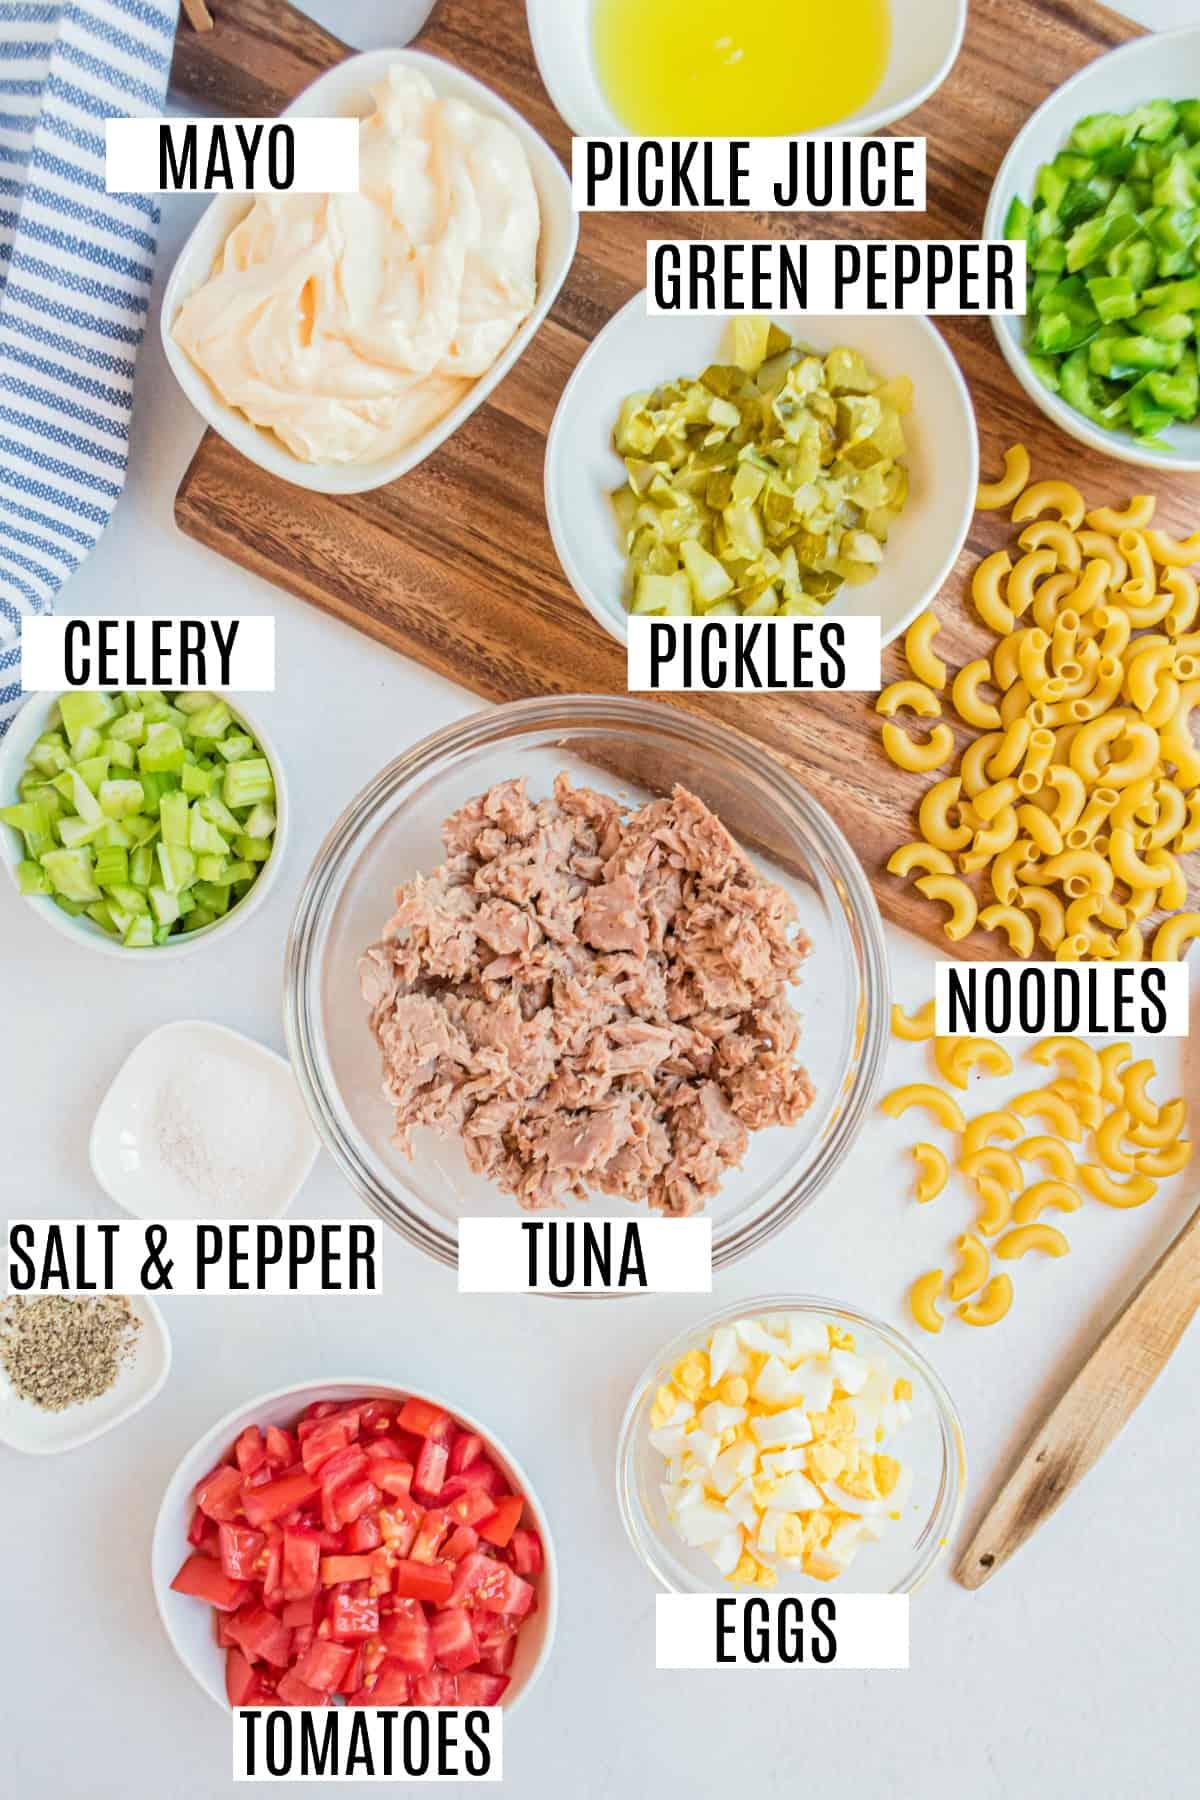 Ingredients to make macaroni salad with tuna.